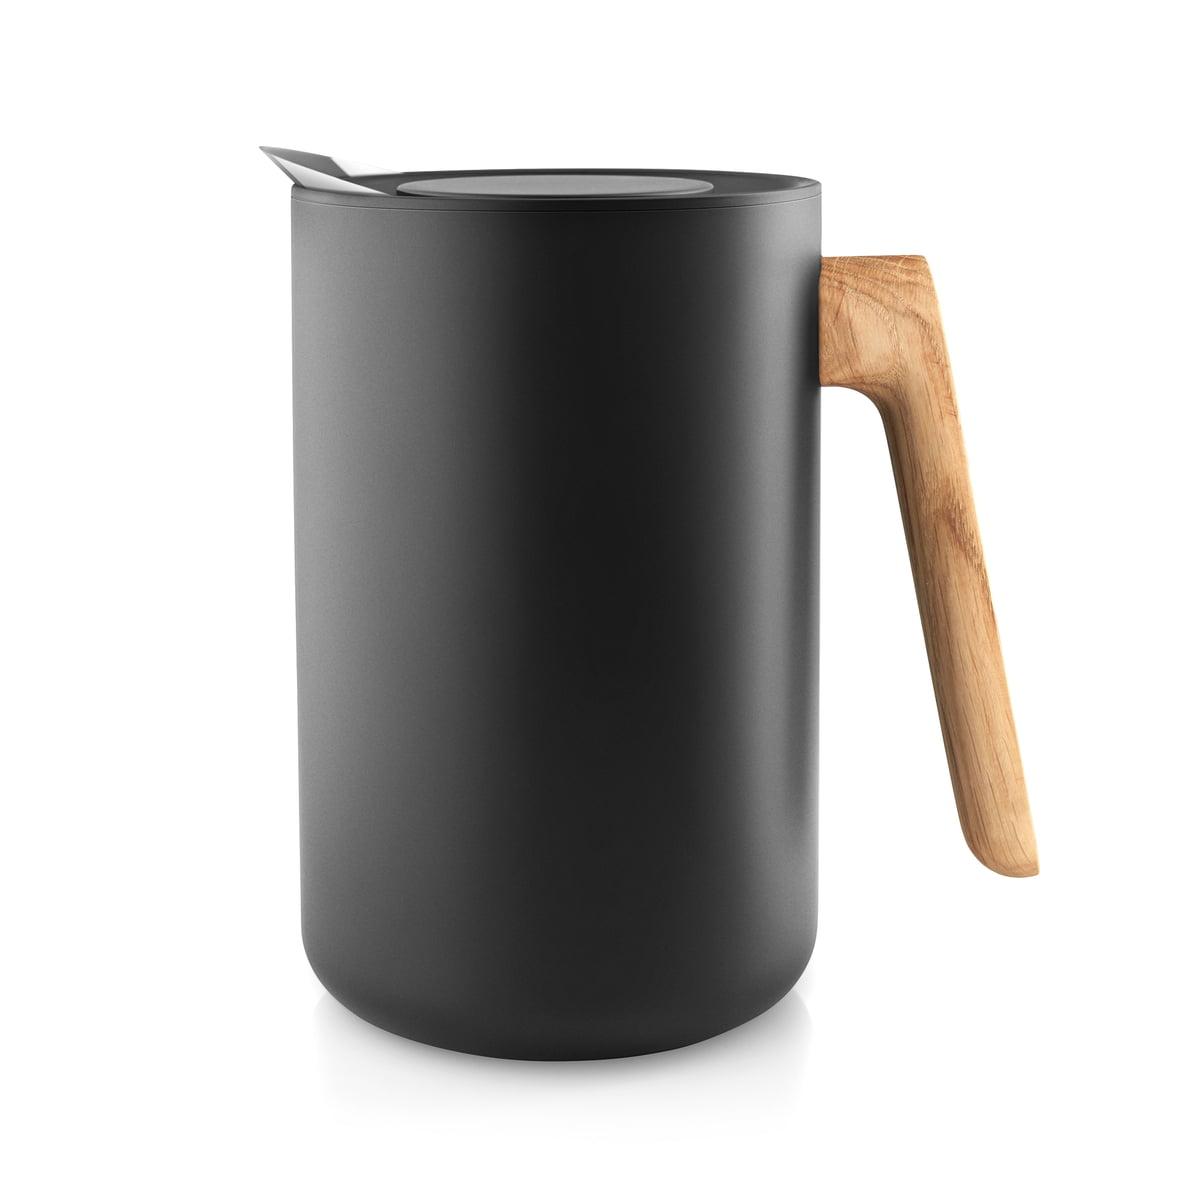 nordic kitchen isolierkanne von eva solo. Black Bedroom Furniture Sets. Home Design Ideas